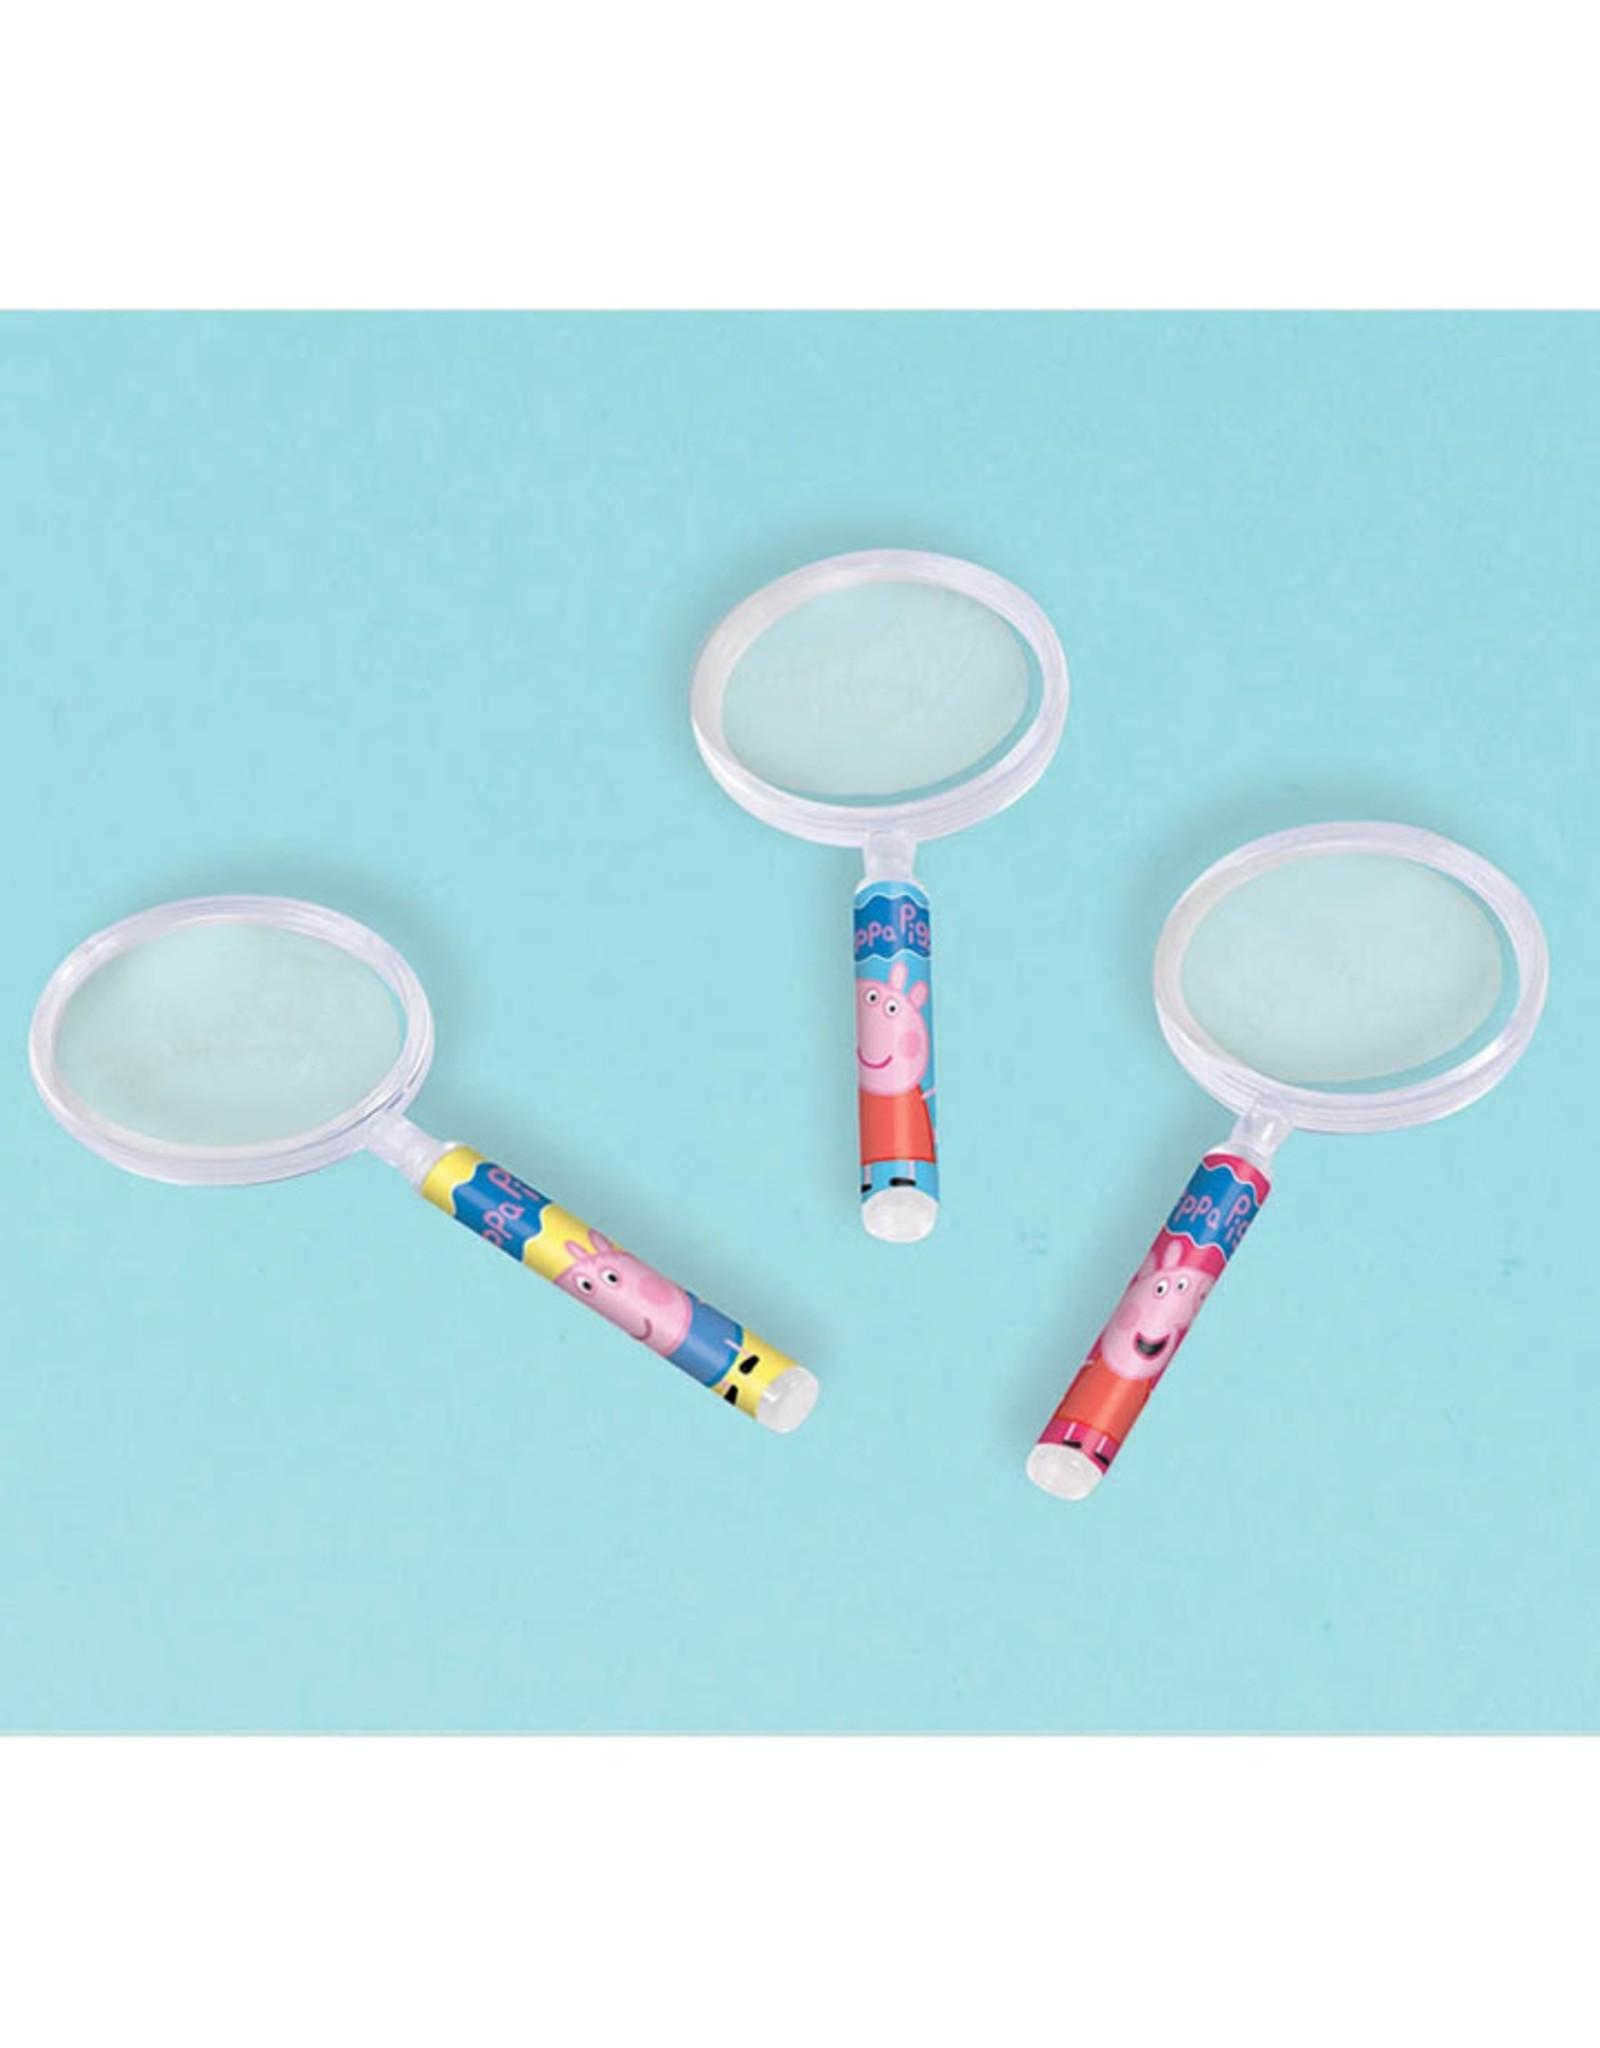 Peppa Pig Magnifying Glasses - 12ct